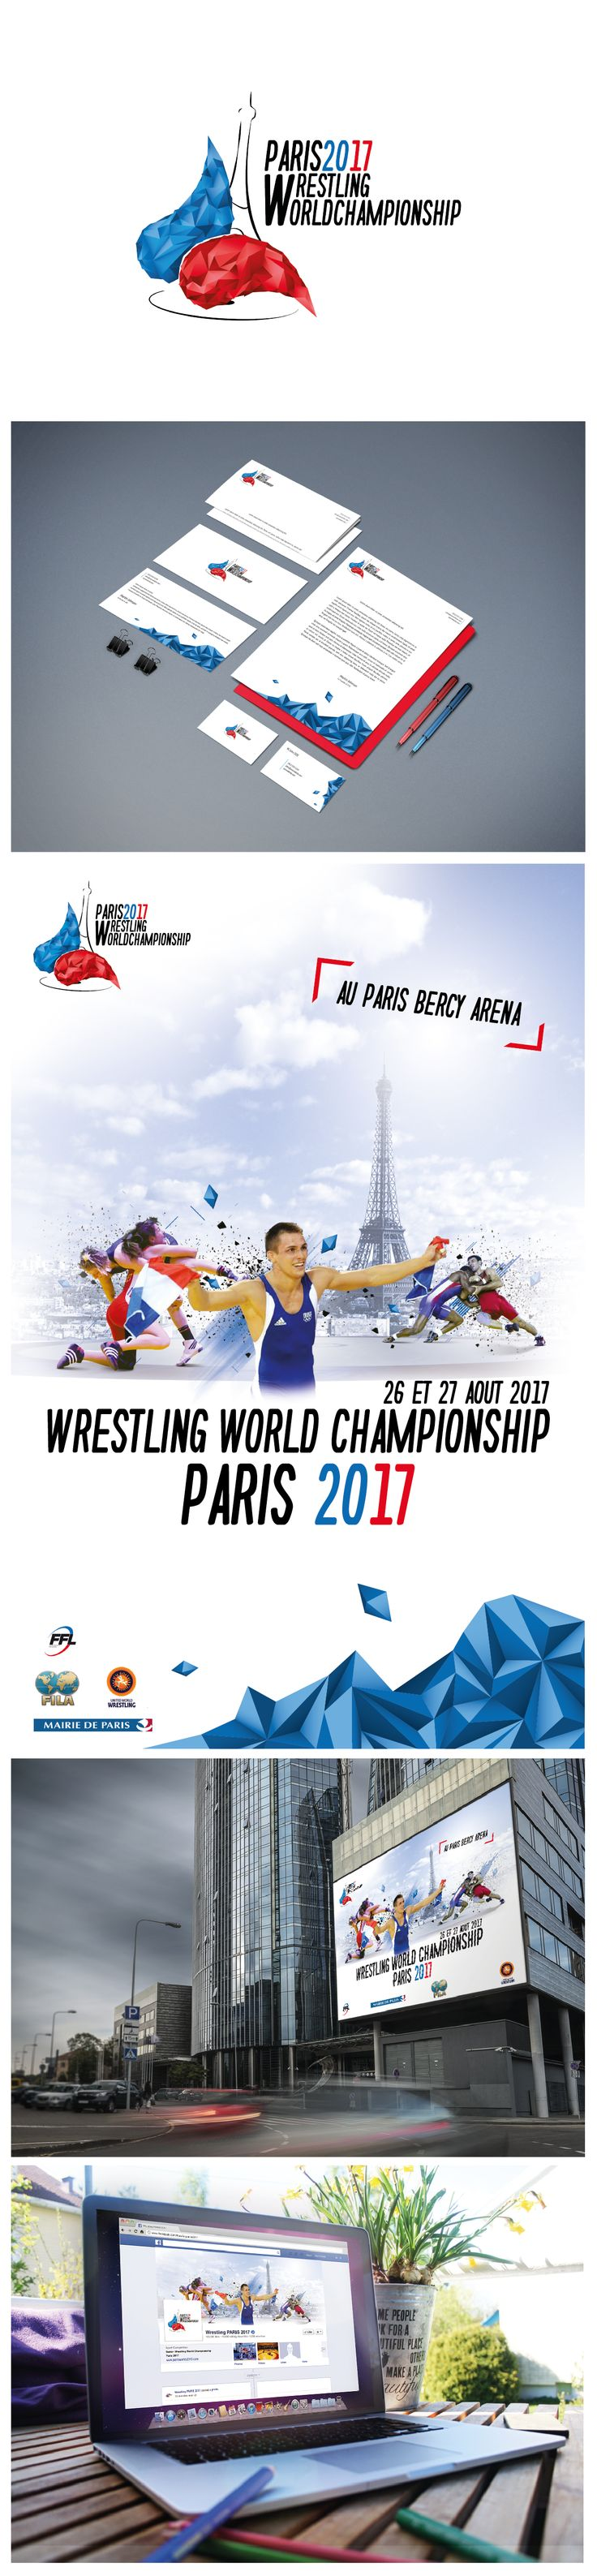 Wrestling World Championship - Paris 2017 (visuels non officiels) #wrestling #lutte #sport #worldchampionship